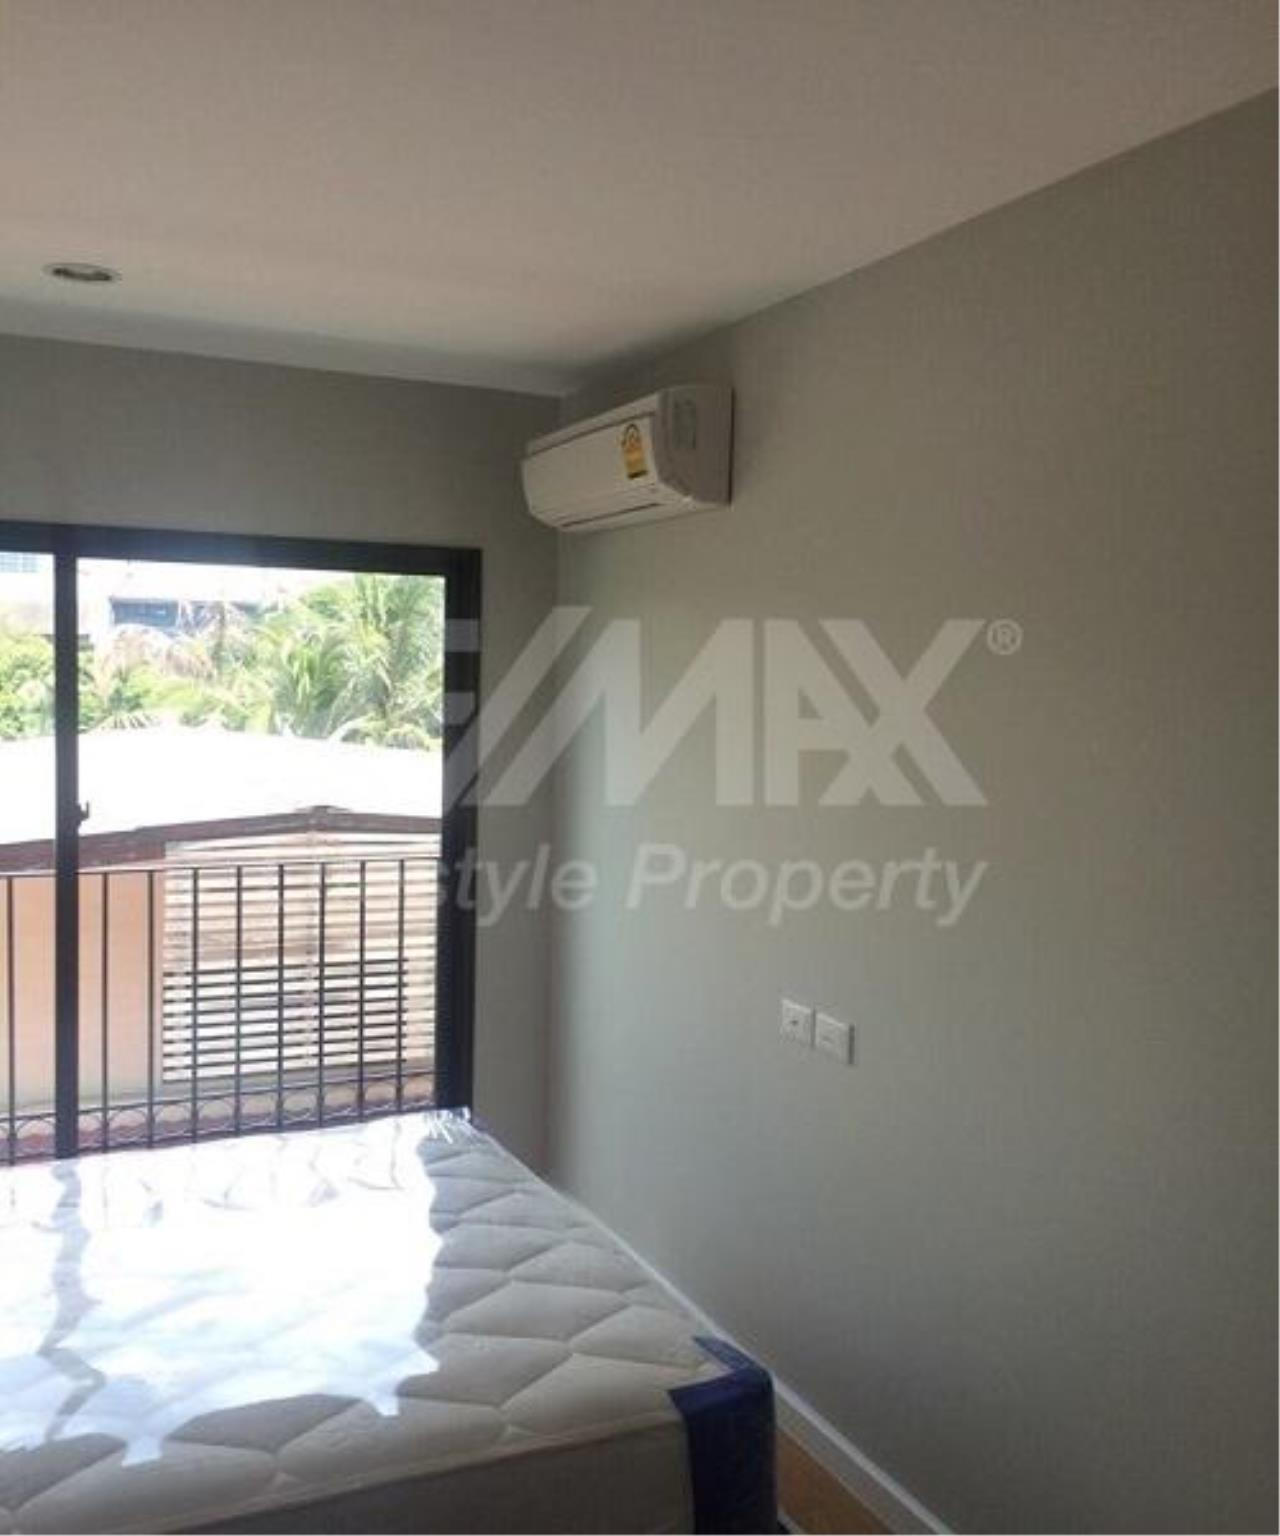 RE/MAX LifeStyle Property Agency's Condolette Dwell Sukhumvit 26 7